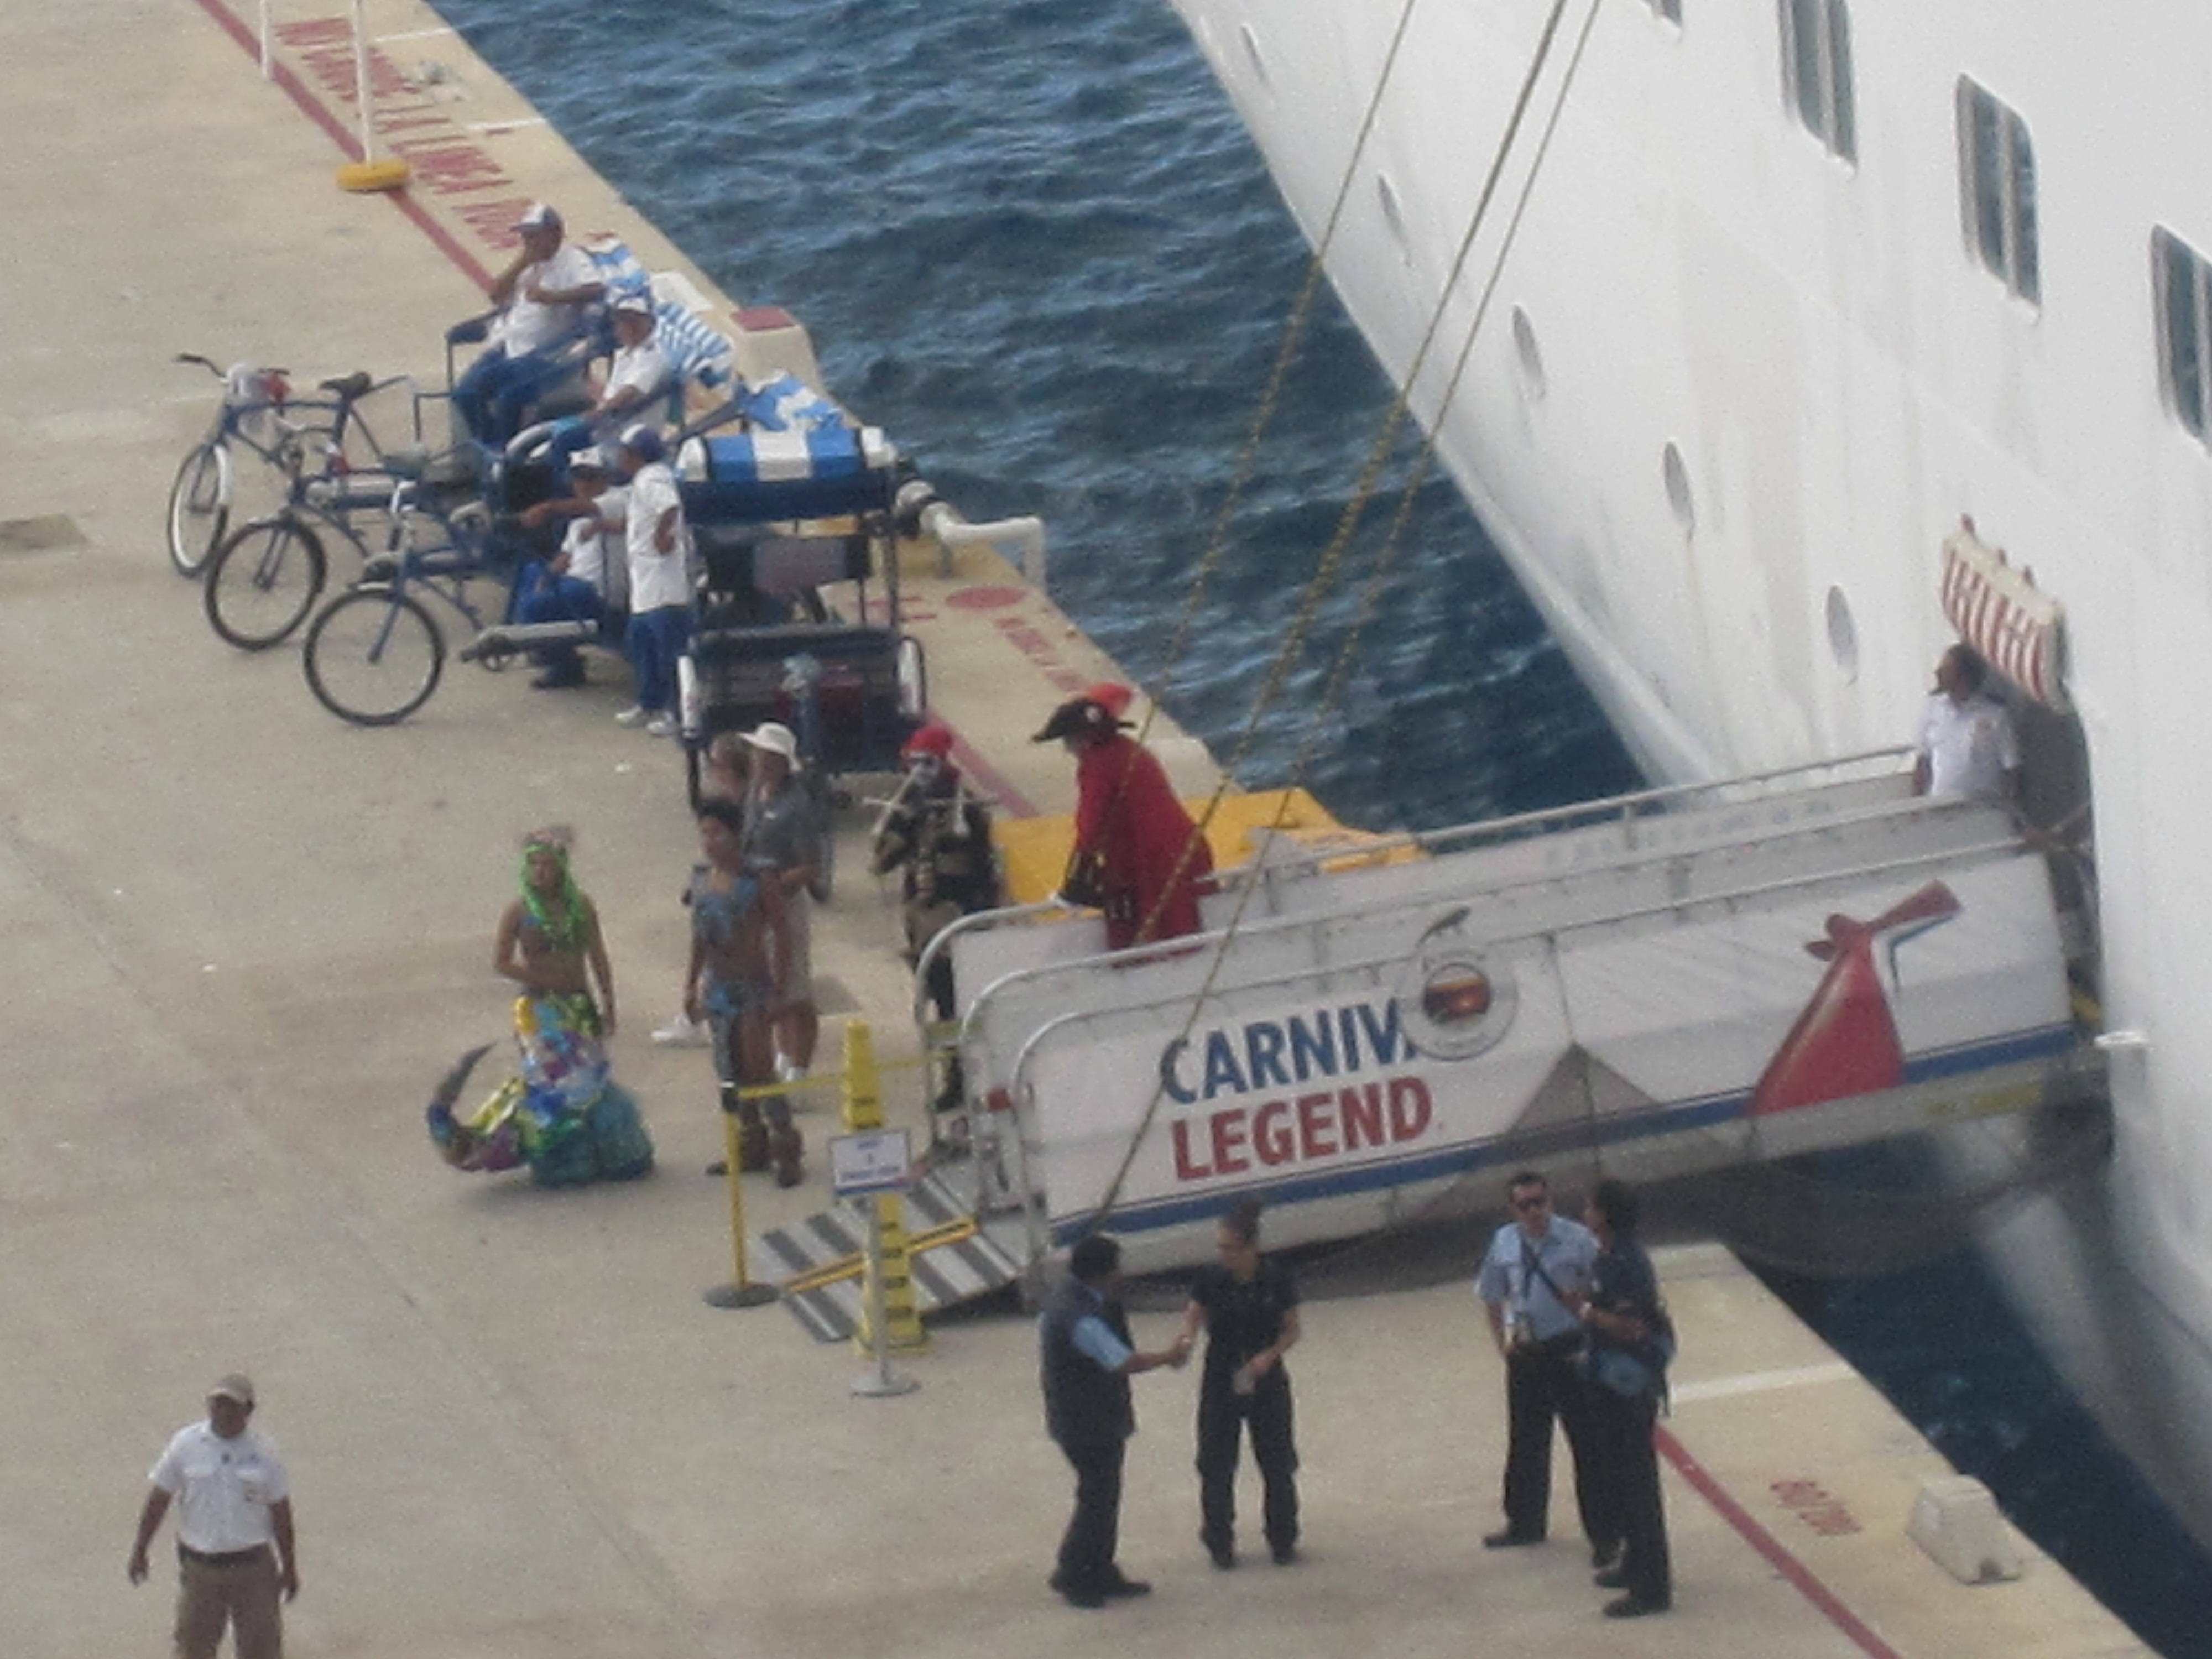 One Liner Jokes About Art : Cruise ship jokes and speedos cruisemiss blog